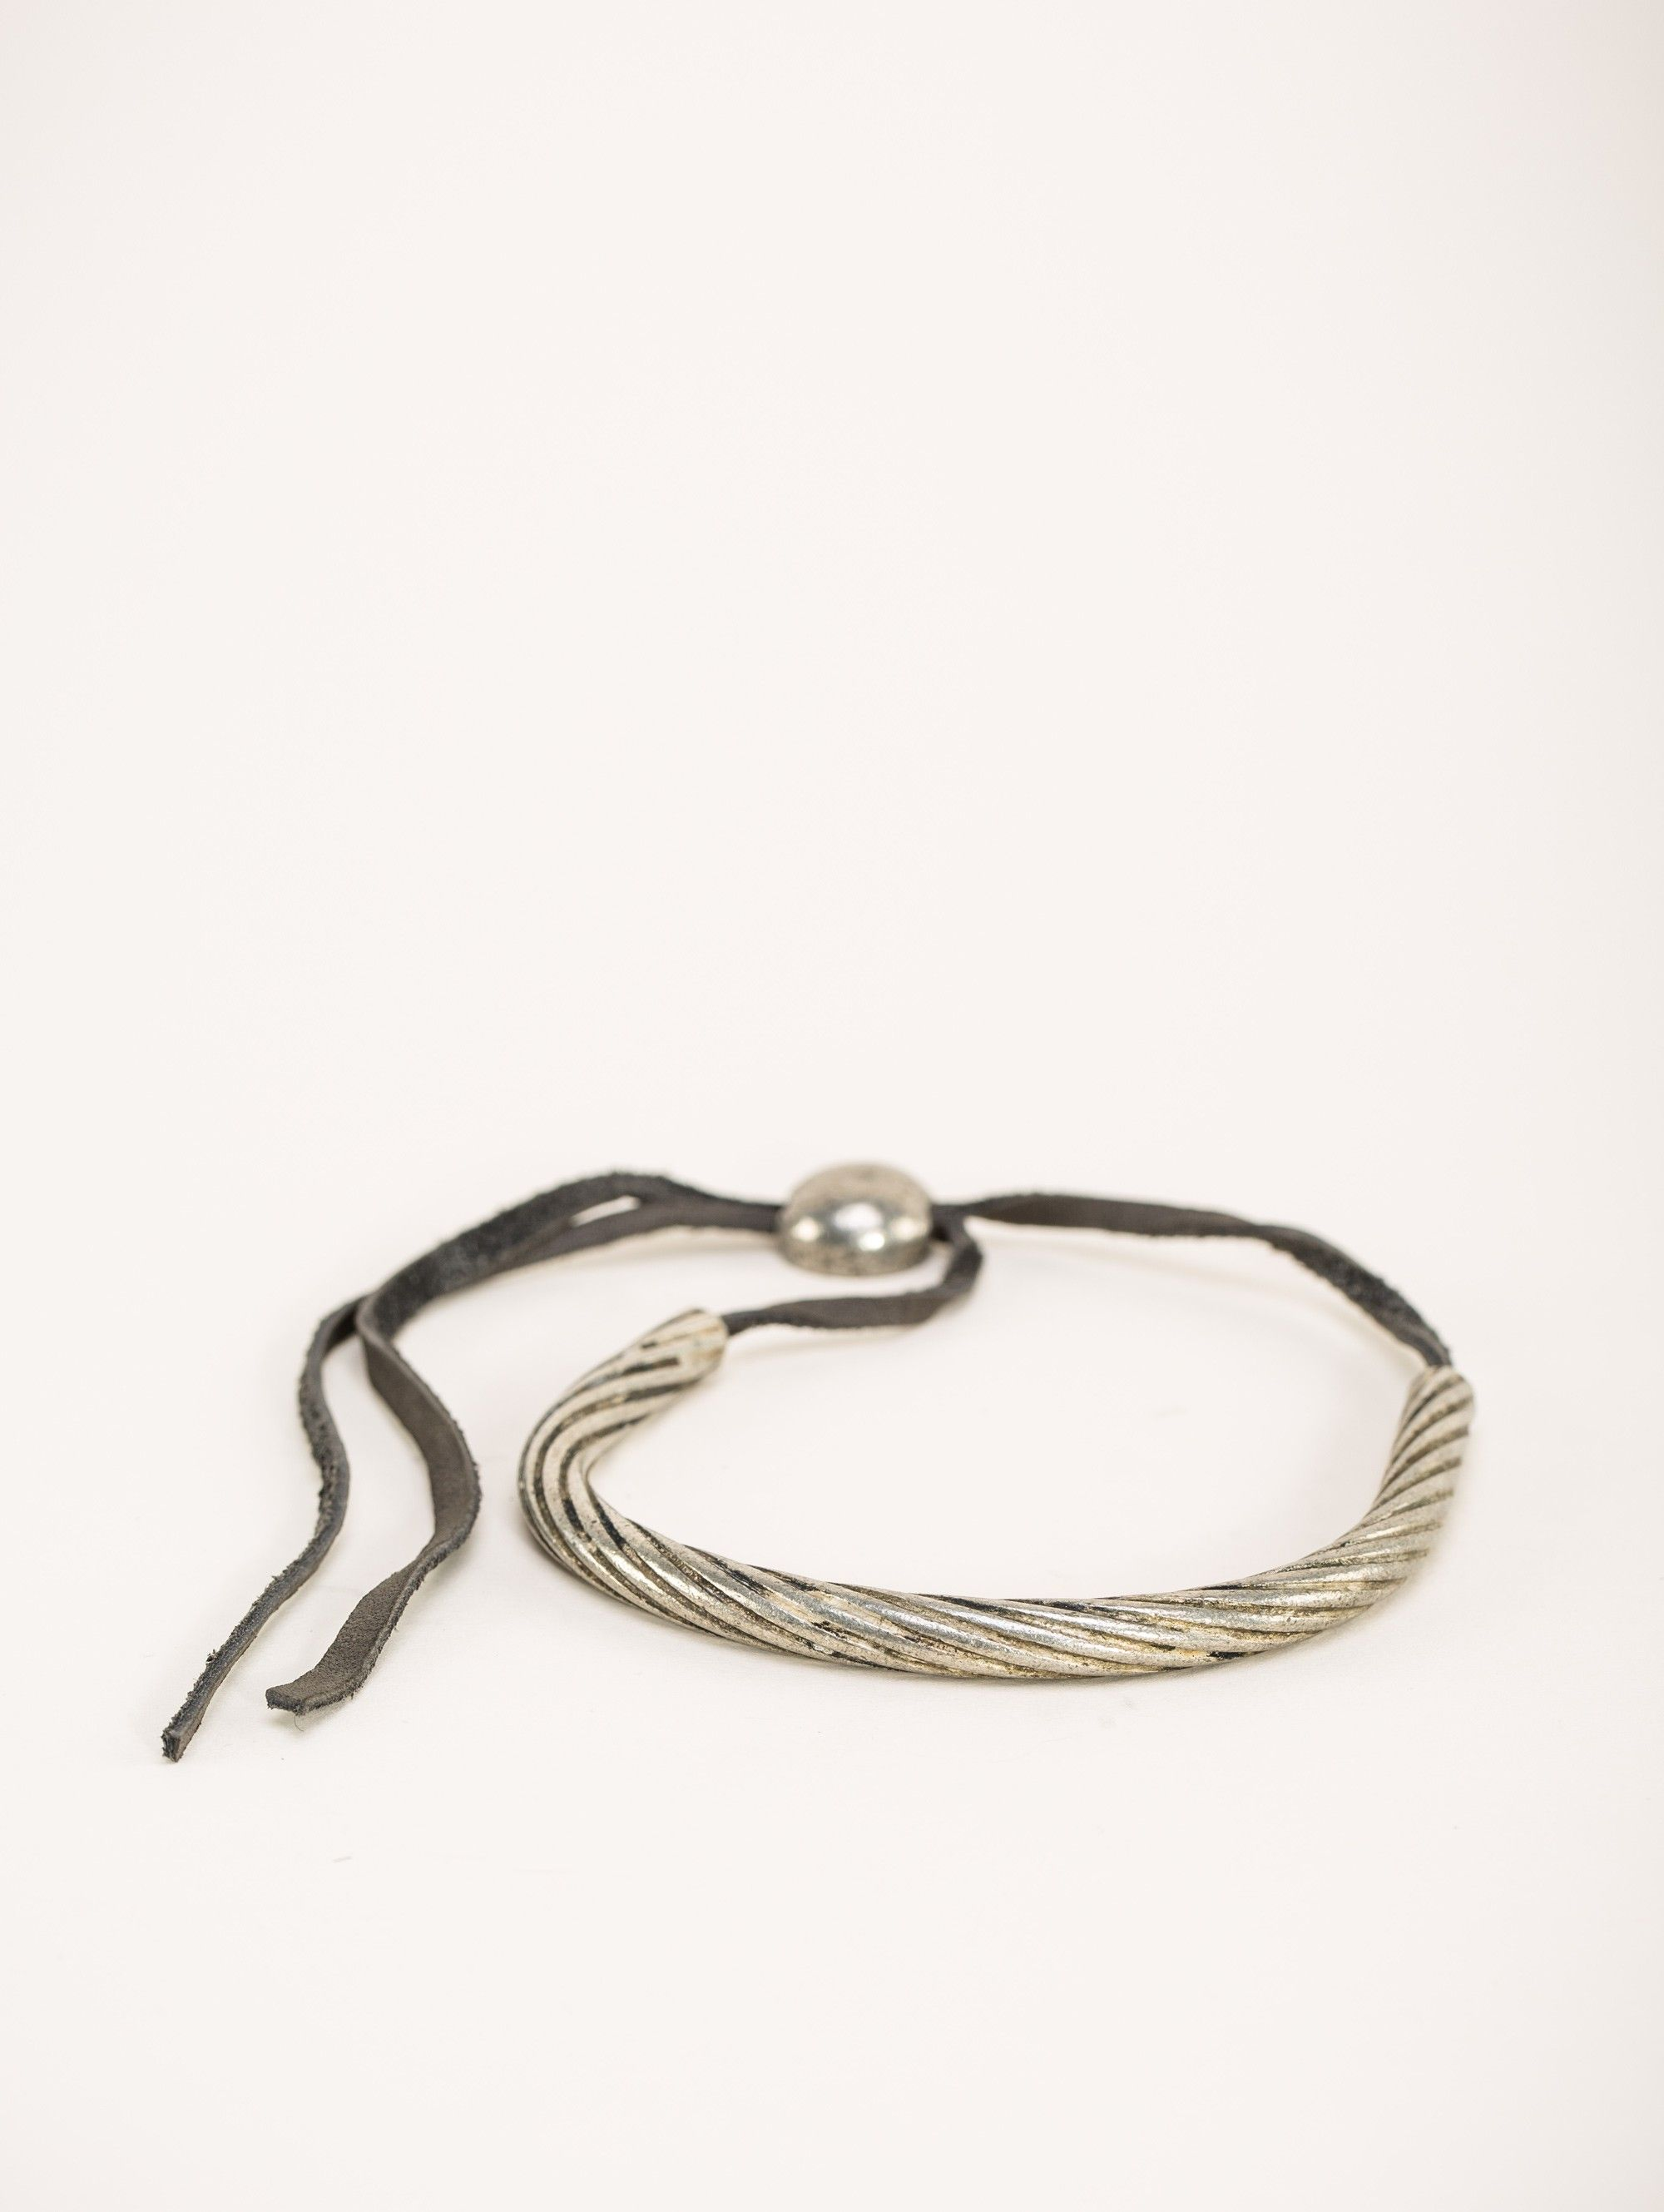 Goti Open tin bracelet $265.04